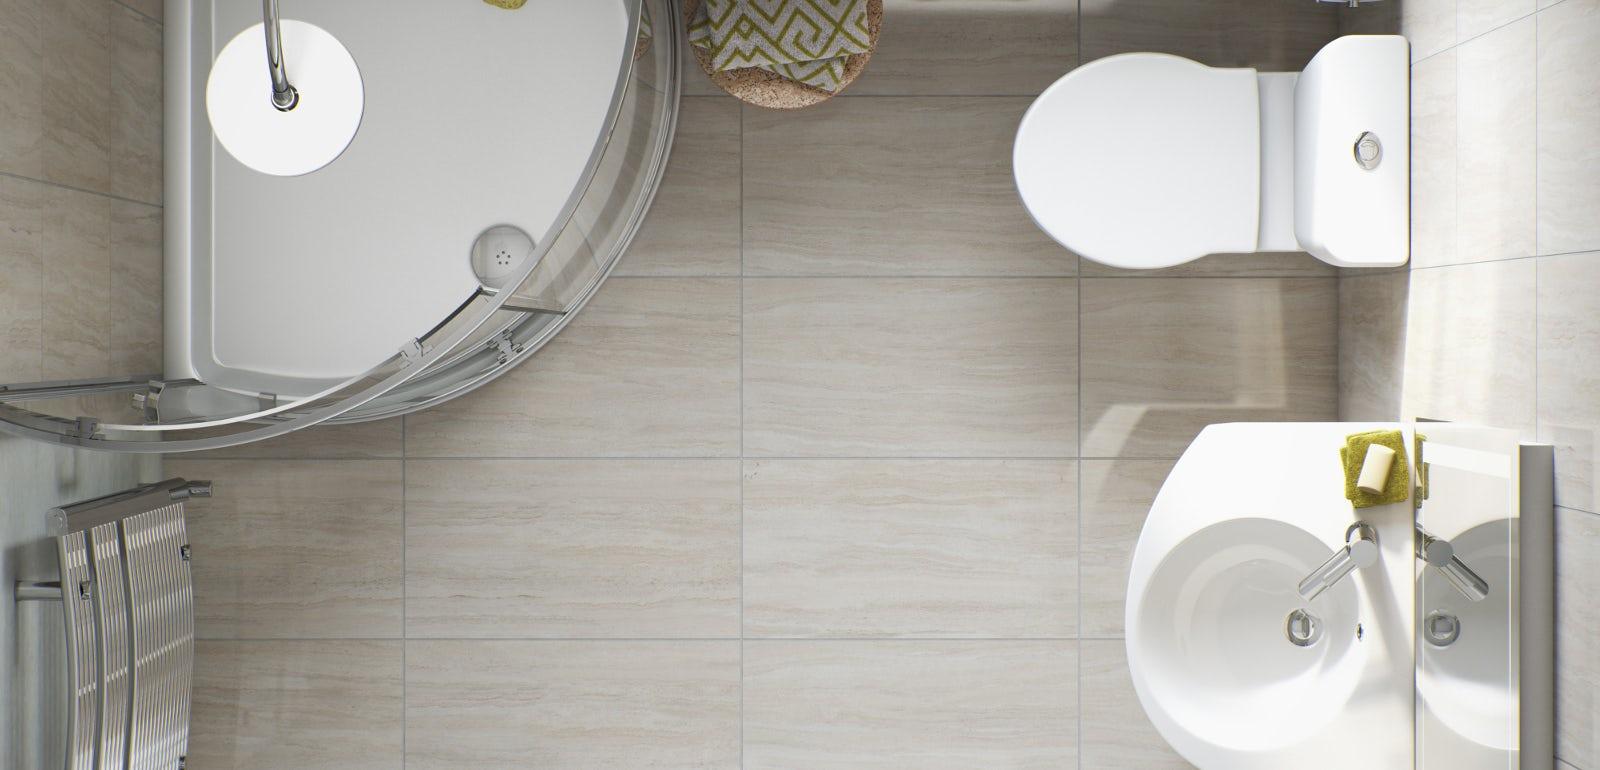 Simple Bathroom Layout Plans Free